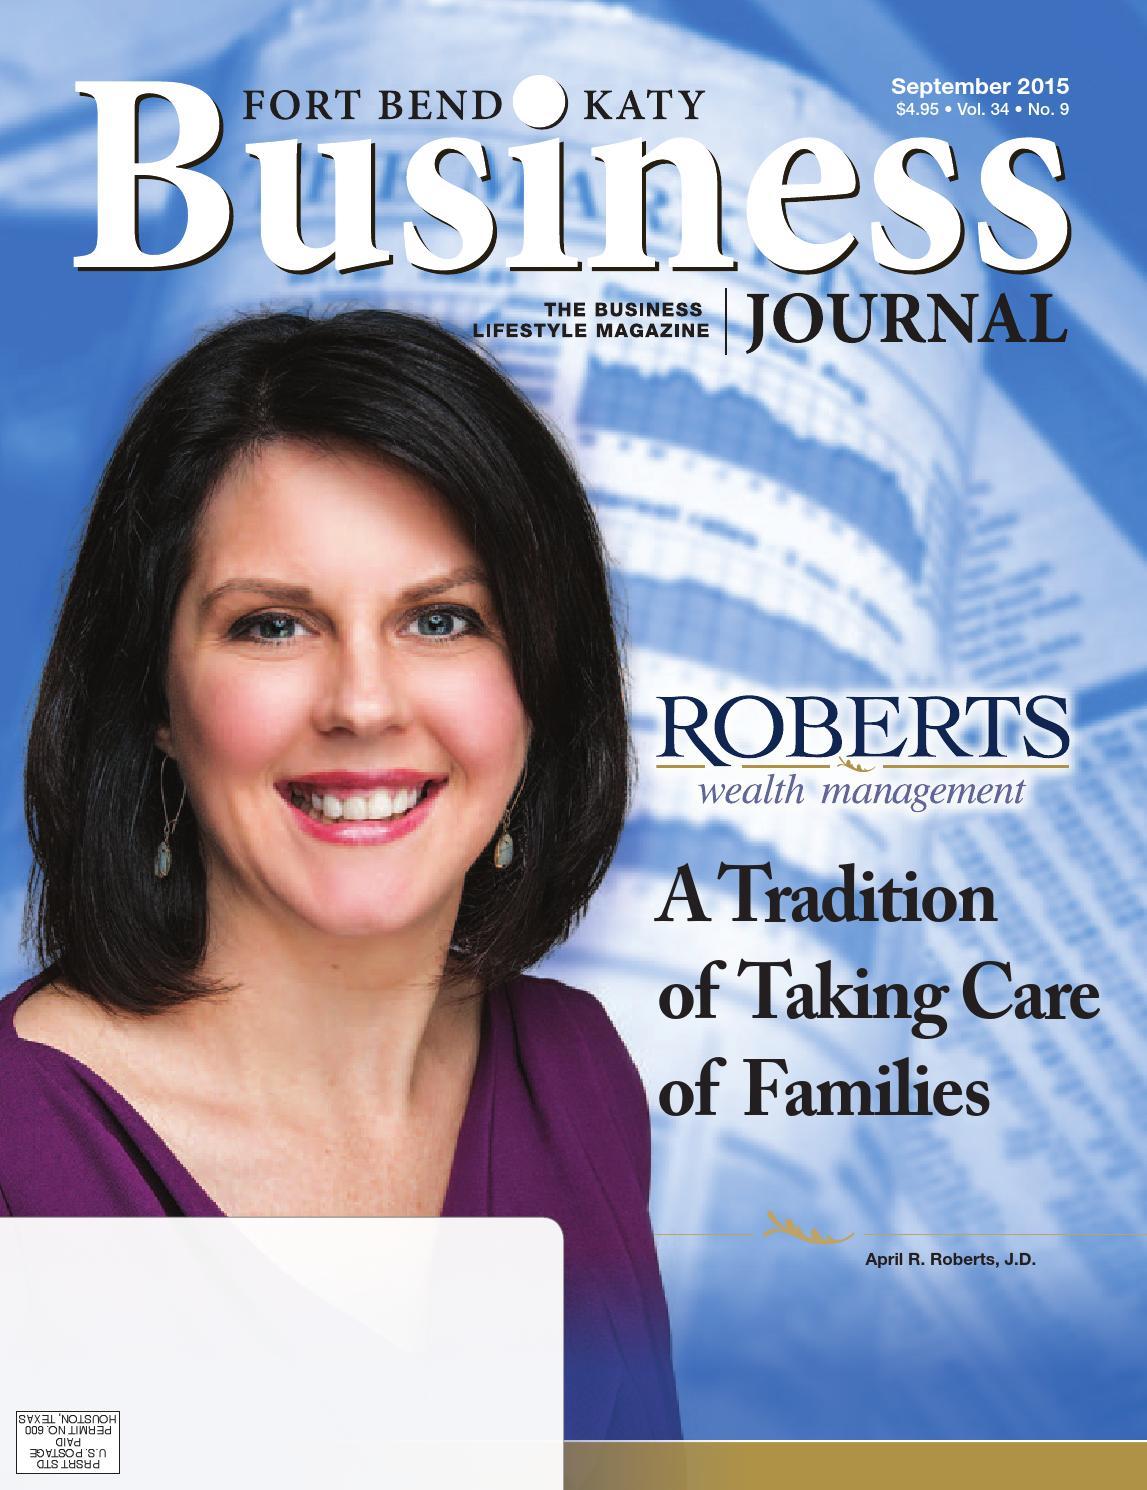 September 2015 - The Business Lifestyle Magazine Digital Edition